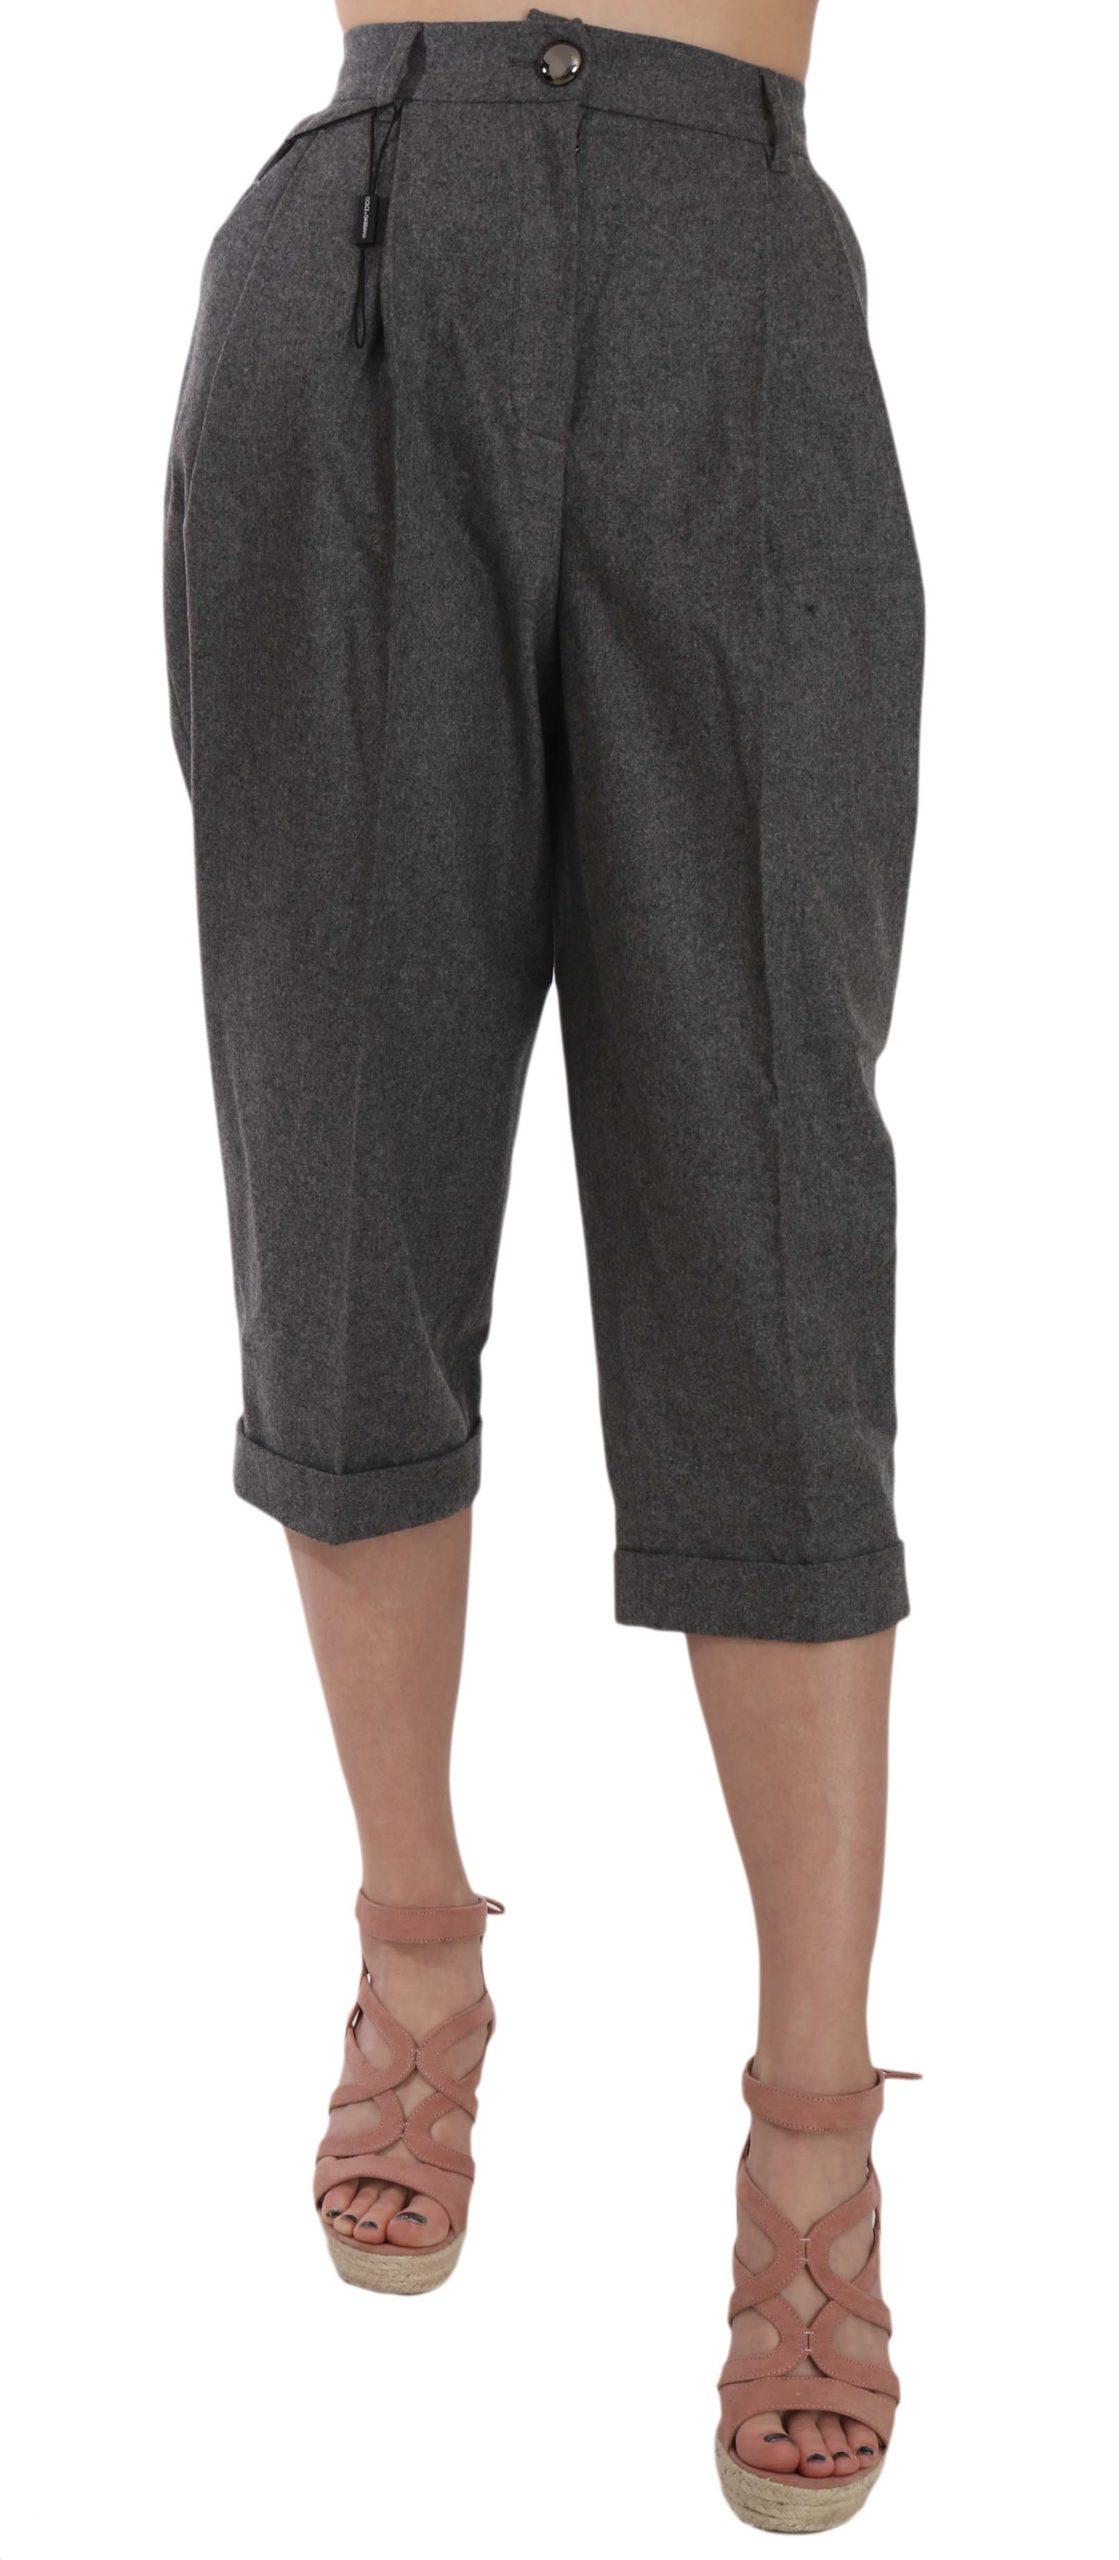 Dolce & Gabbana Women's Cropped Trouser Pleated Trouser Gray PAN70005 - IT36|XXS